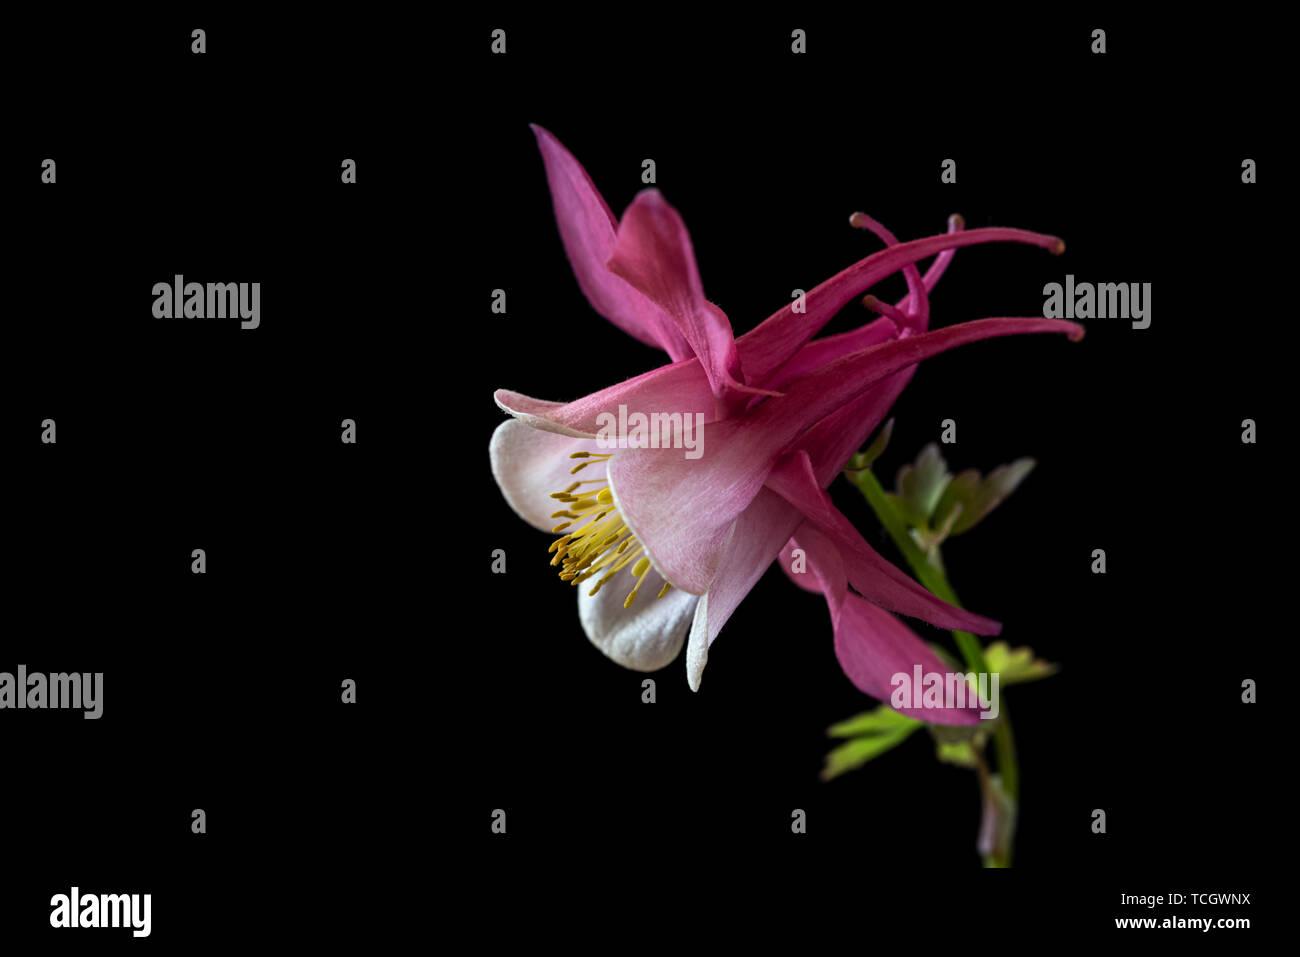 Aquilegia Spring Magic Rose and White,spring magic series,Ranunculaceae,low key life science, black background Stock Photo